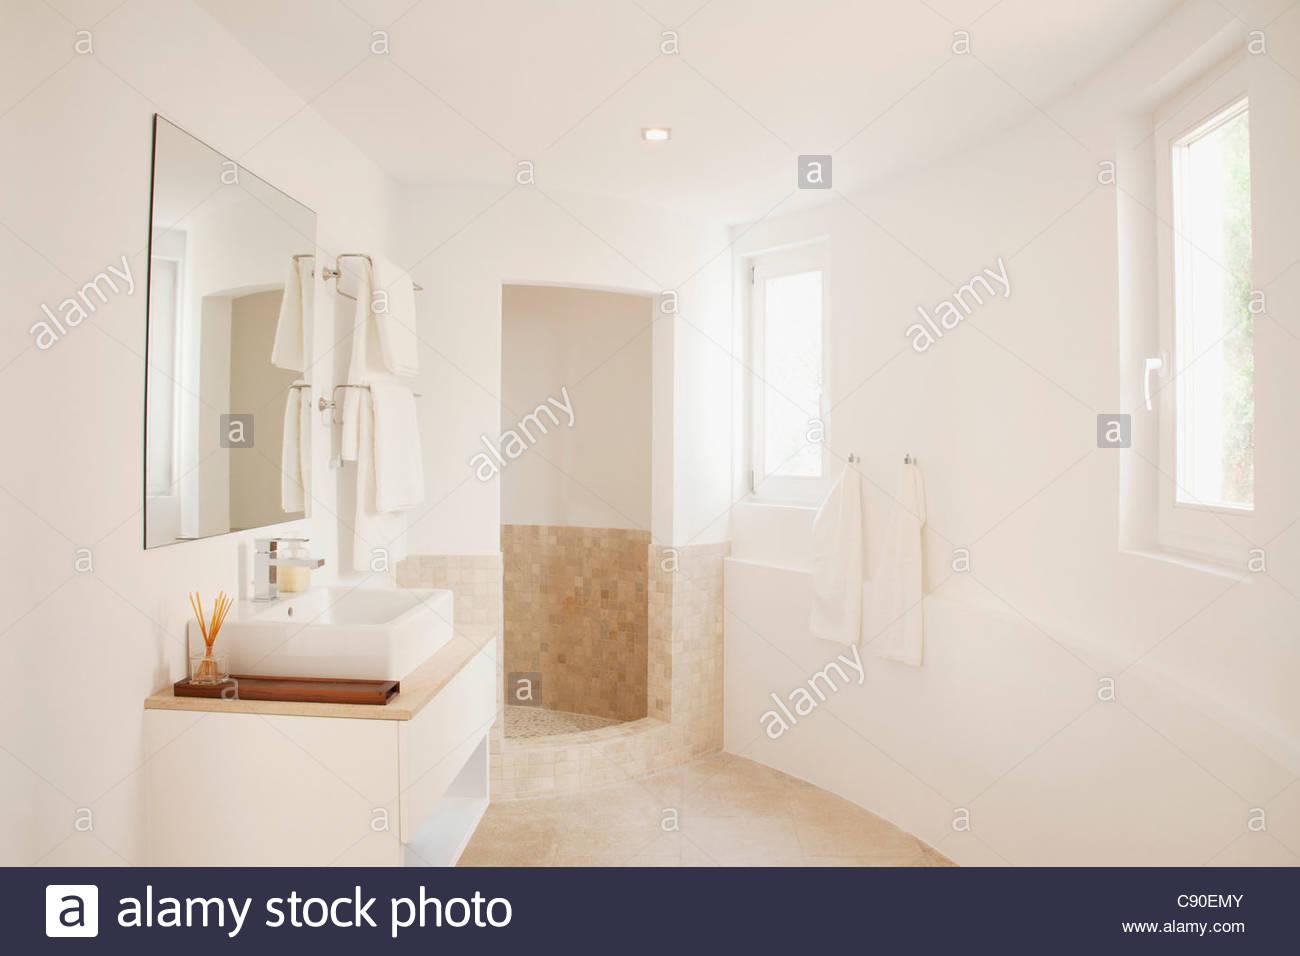 Sink in modern bathroom - Stock Image